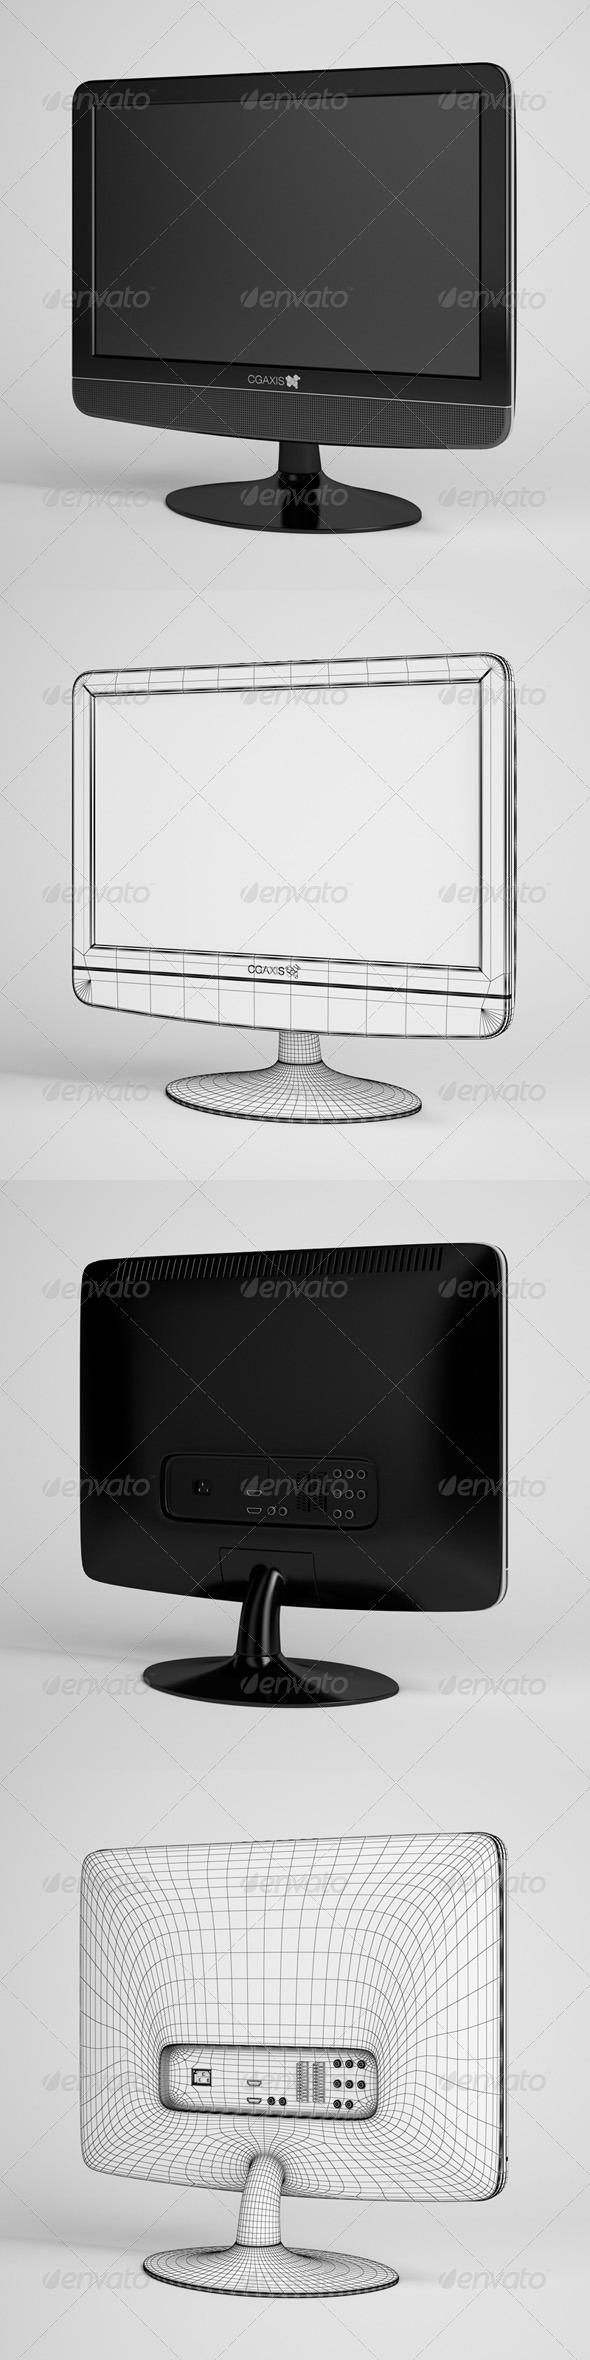 3DOcean CGAxis Flatscreen TV Electronics 05 165749